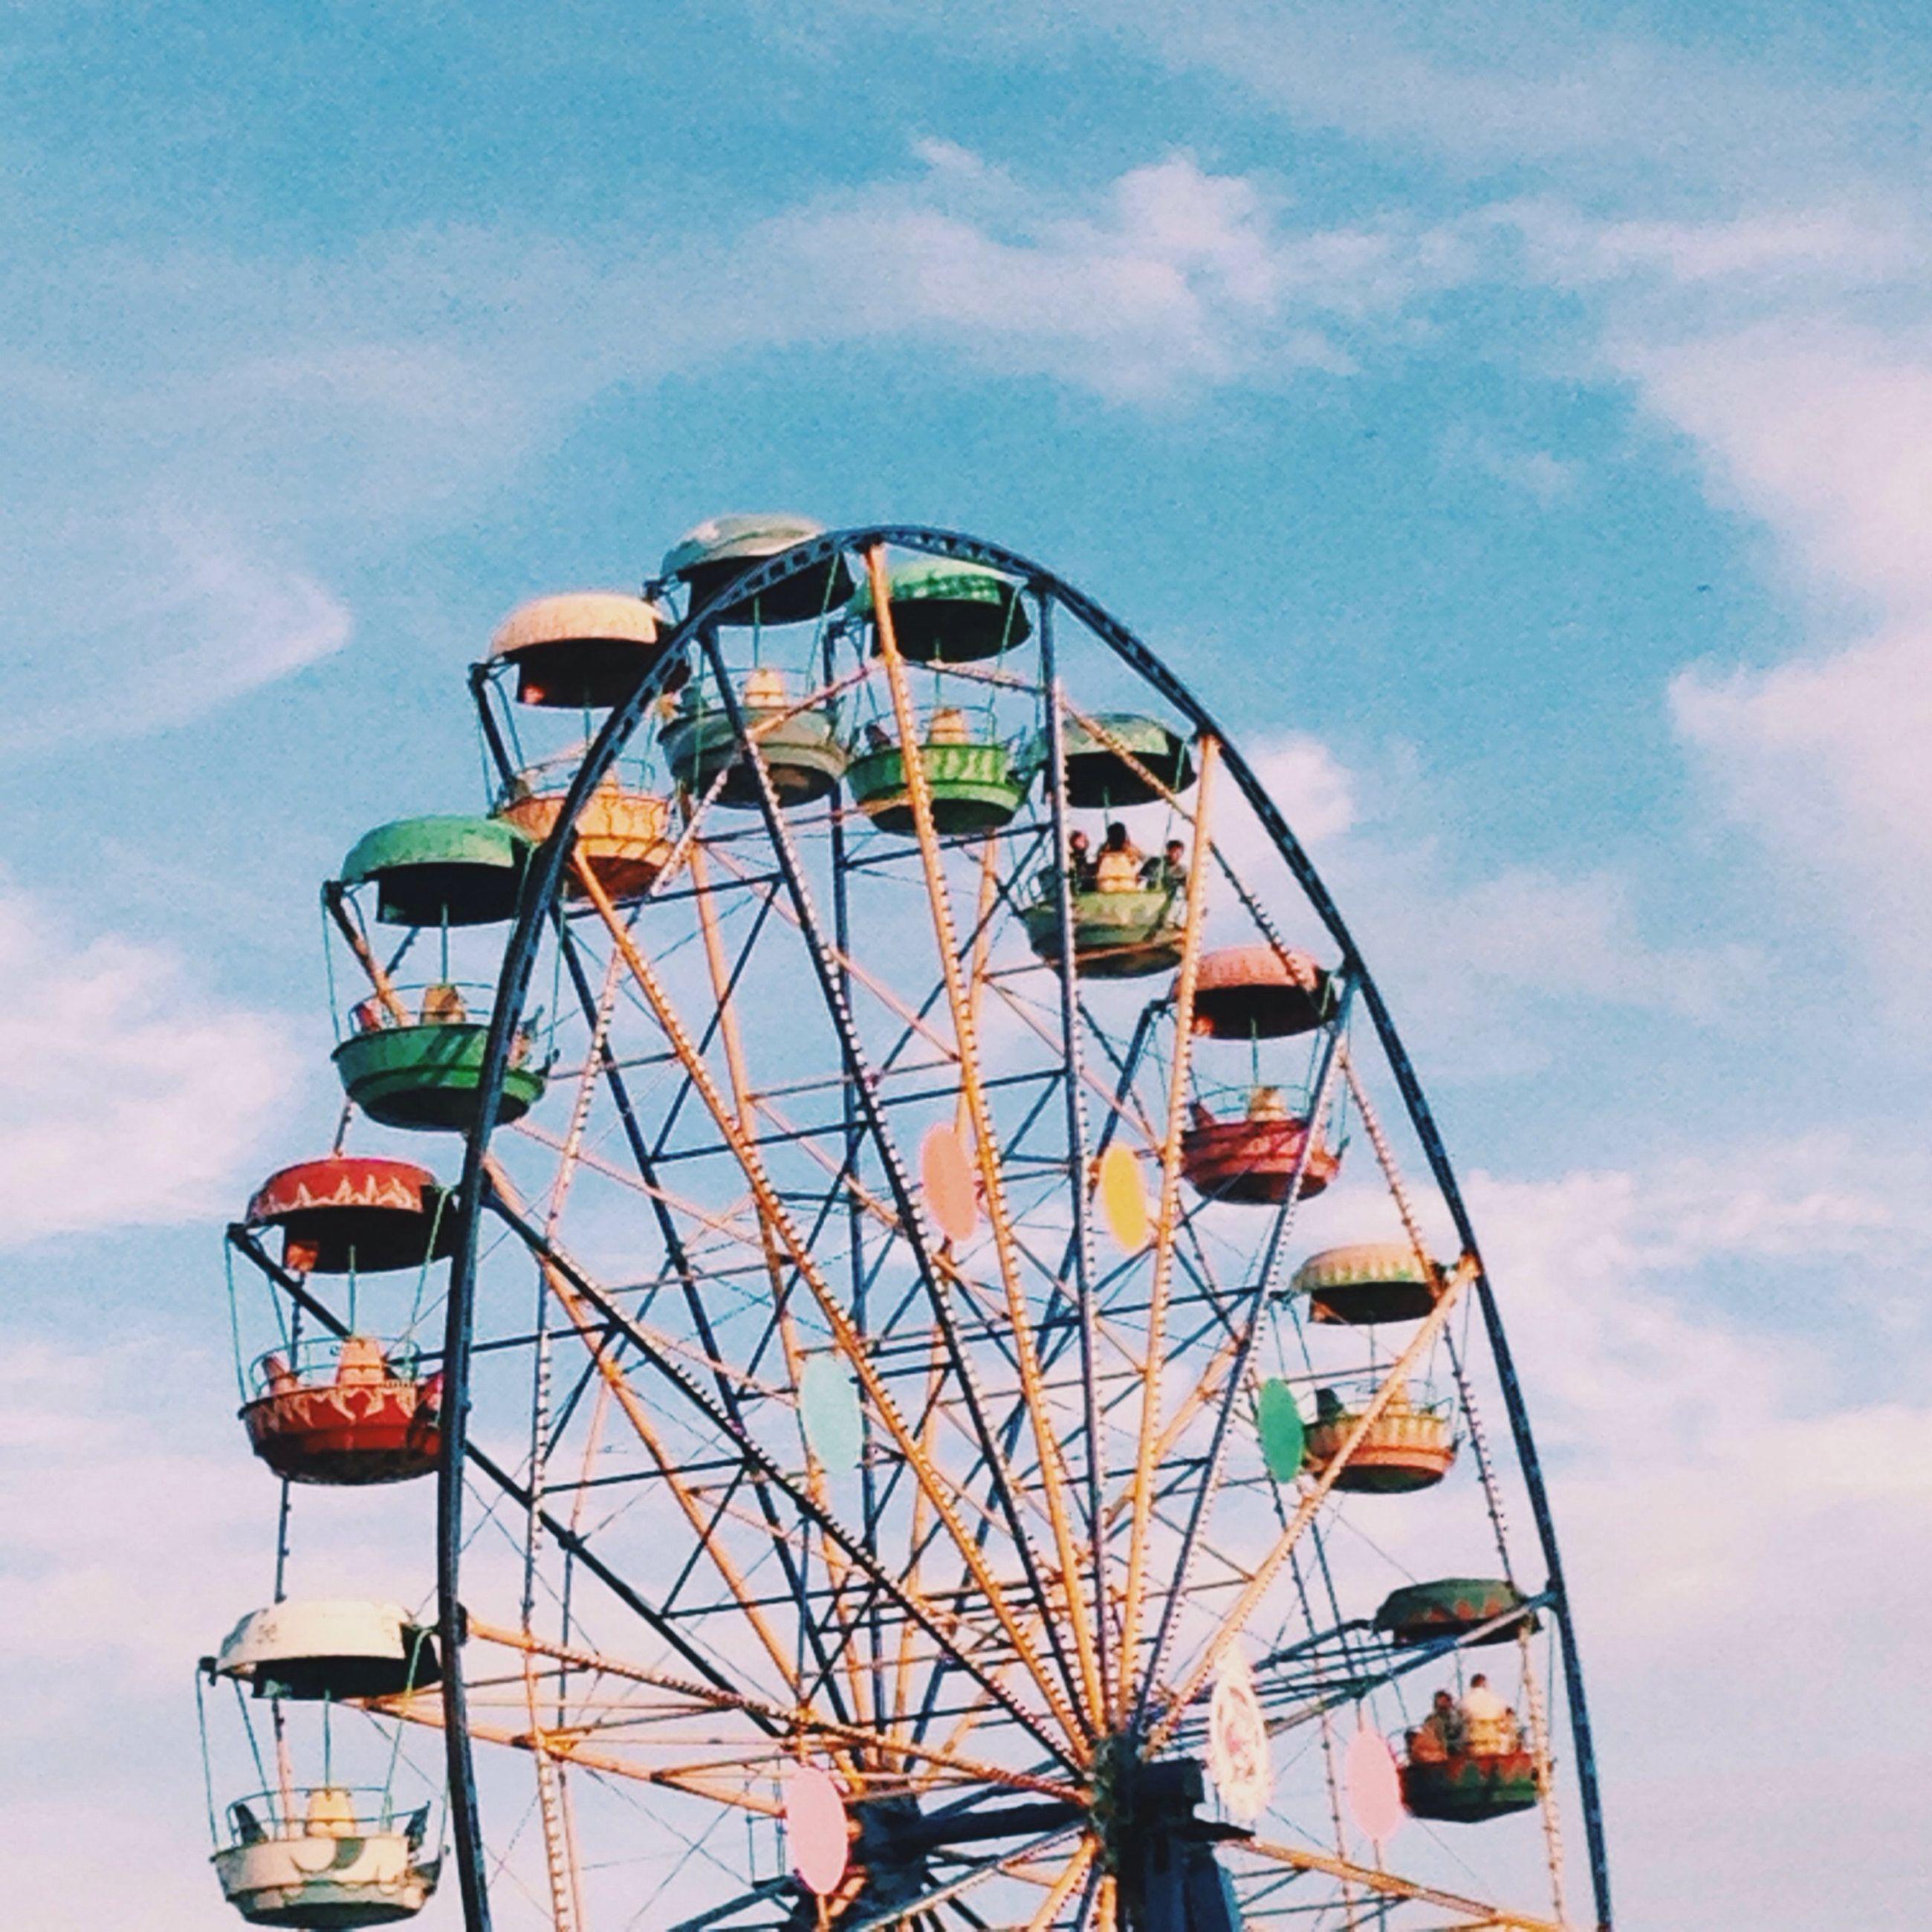 amusement park, amusement park ride, ferris wheel, sky, low angle view, arts culture and entertainment, cloud - sky, transportation, mode of transport, built structure, cloud, day, outdoors, cloudy, leisure activity, multi colored, wheel, architecture, fun, metal